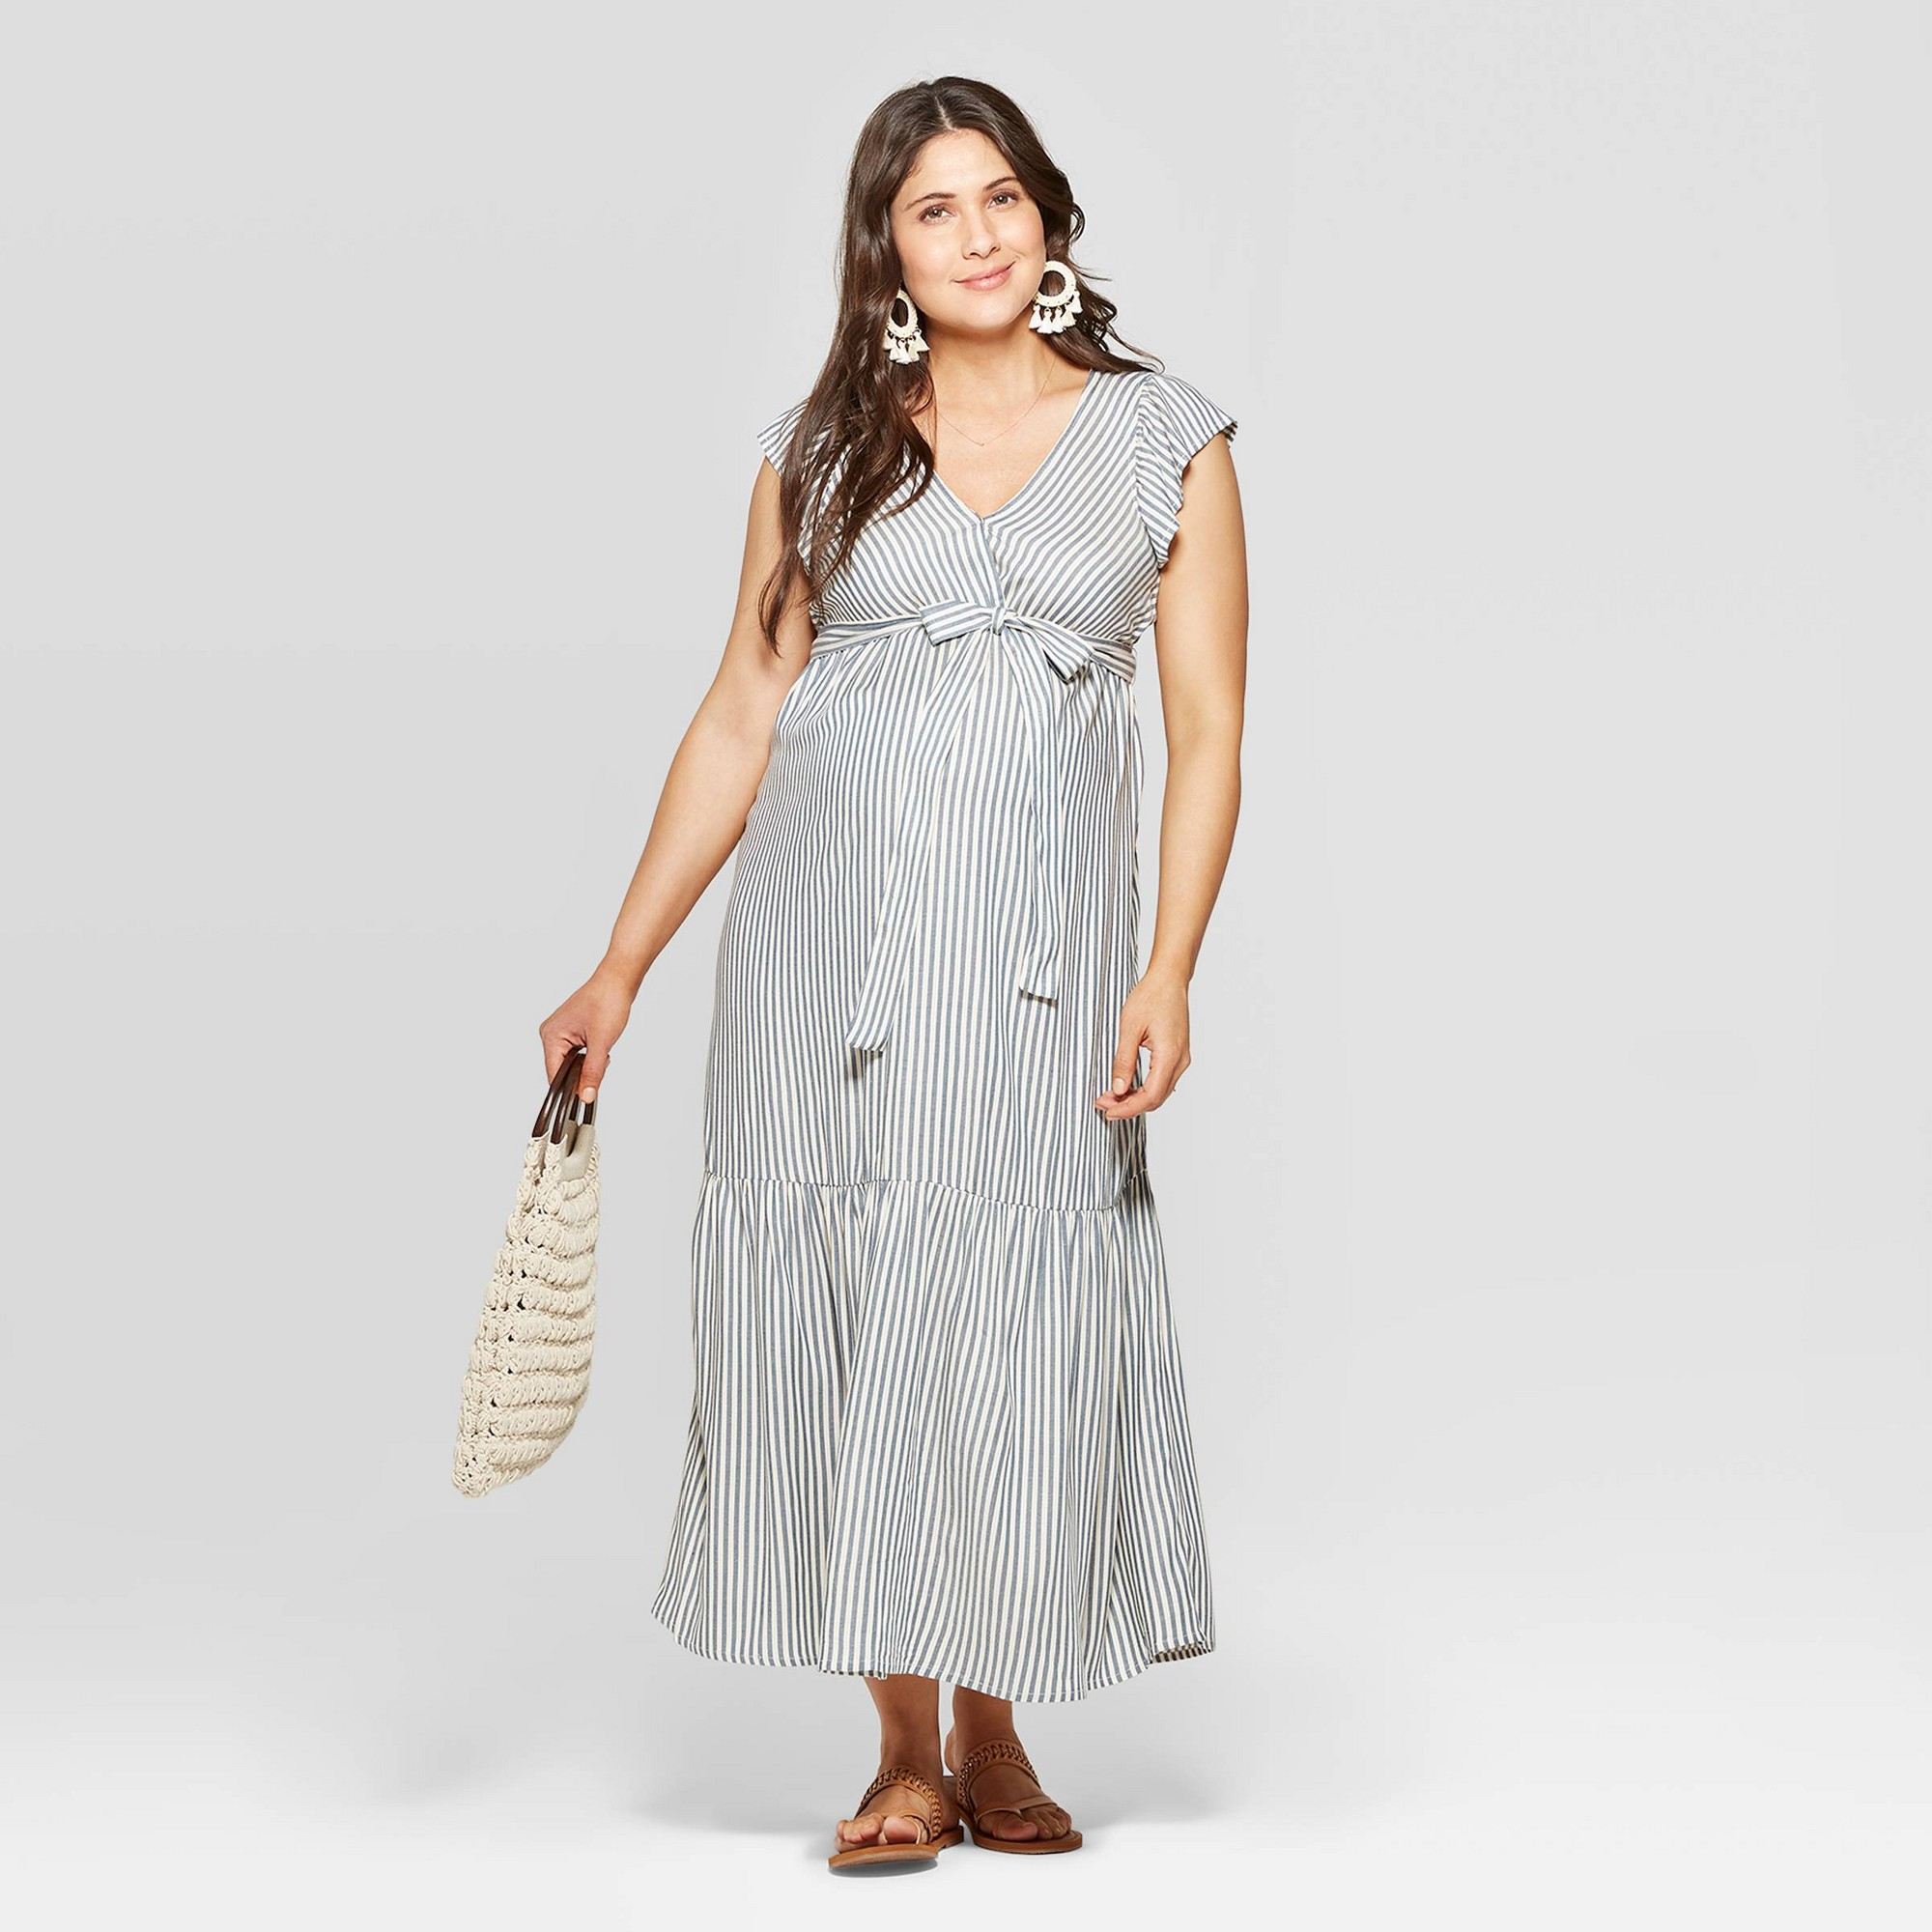 Maternity Striped Short Sleeve V-Neck Neck Midi Dress - Isabel Maternity by Ingrid & Isabel Blue M, Women's, Gray